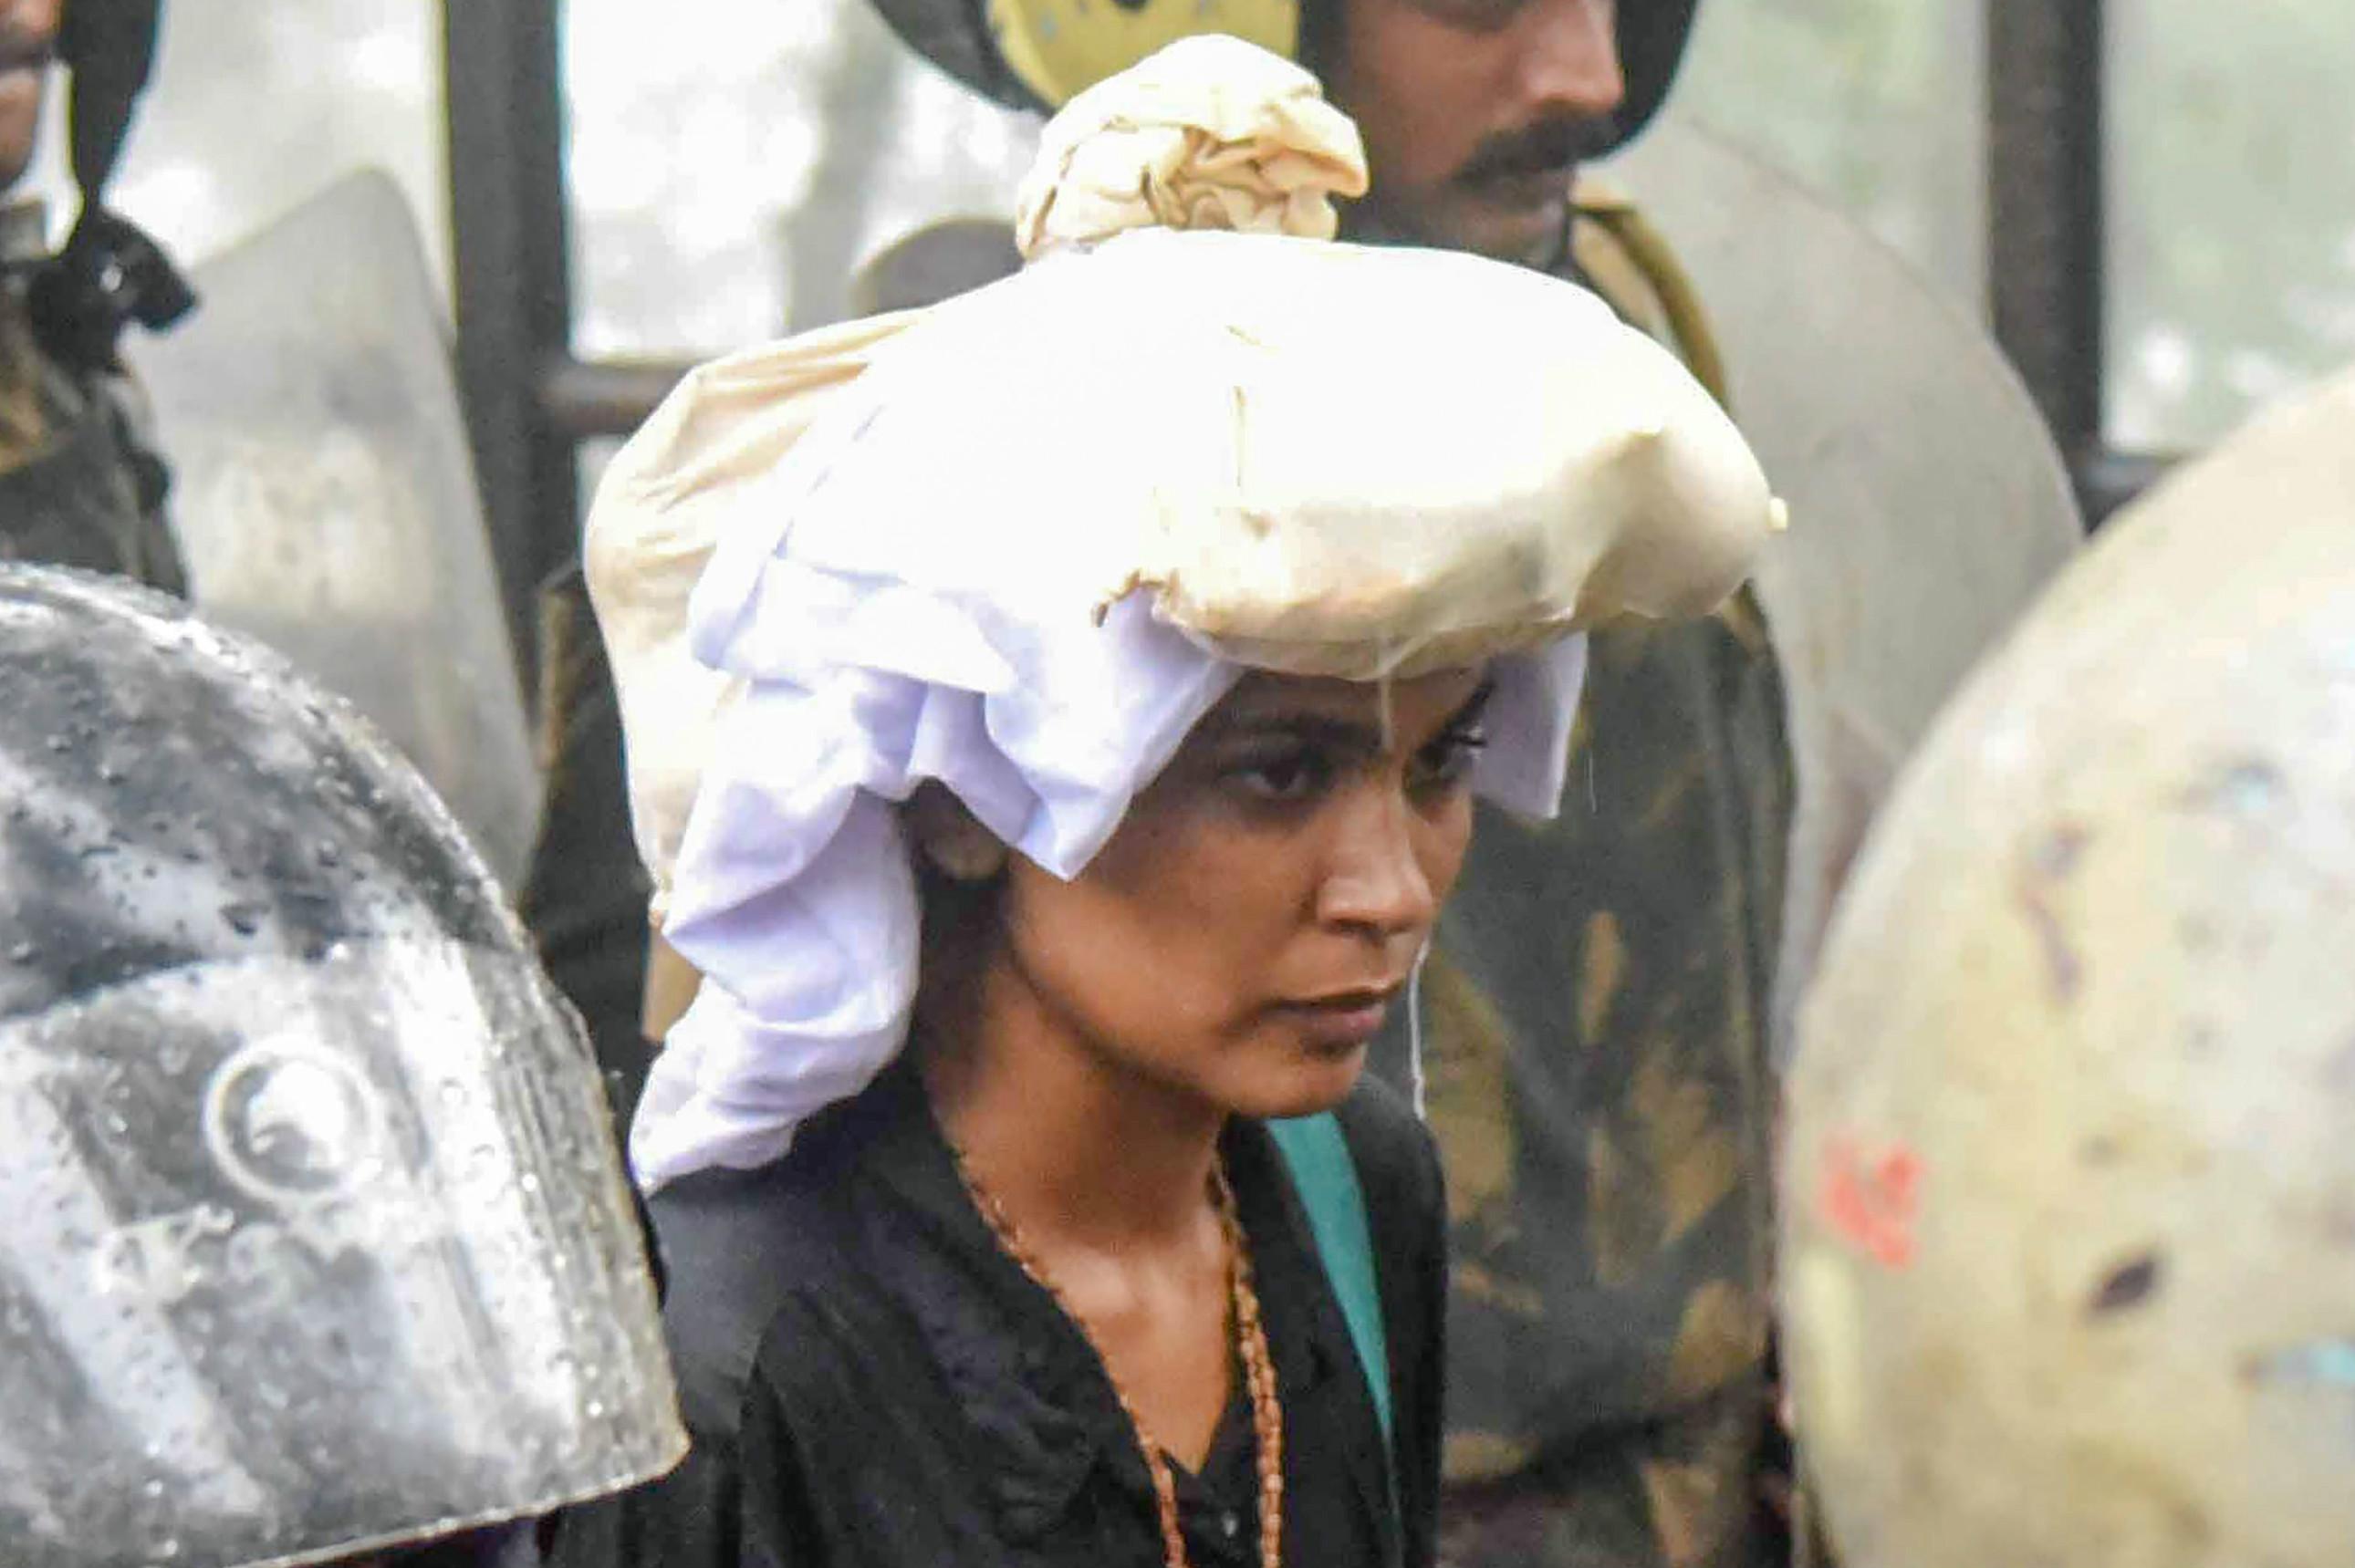 Activist Rehana Fathima expelled from Muslim community for hurting Sabarimala devotees